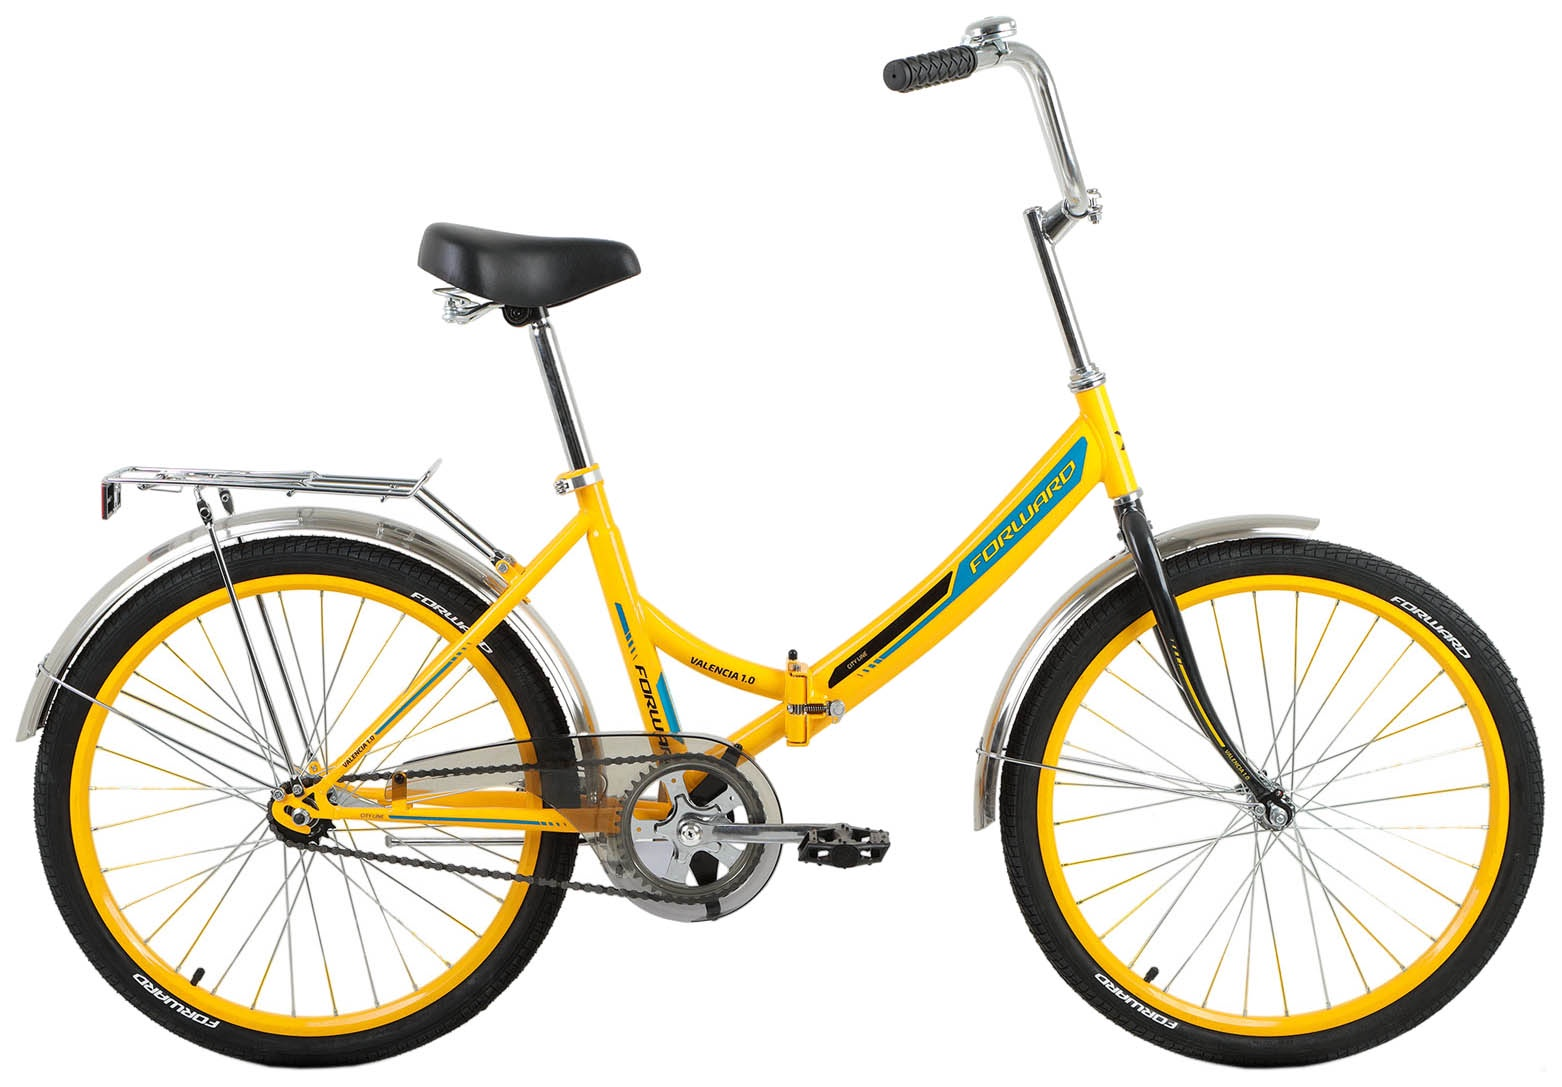 педальные машины Складной Forward VALENCIA 1.0, RBKW8YF41003, желтый